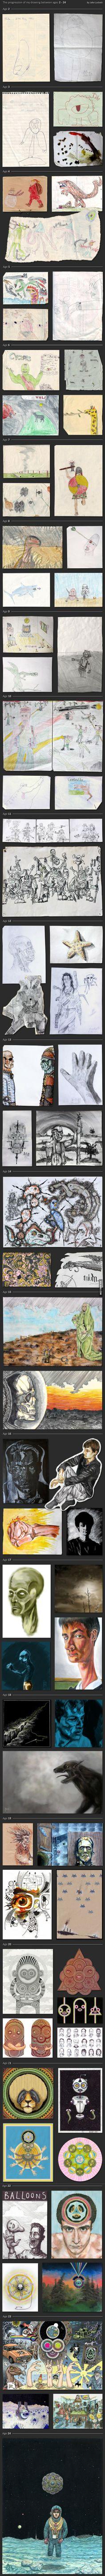 Epic drawing progression, ages 2-24. Evidently violent kid from 7-12, depressed 13-19, on acid 20-24. LOL!